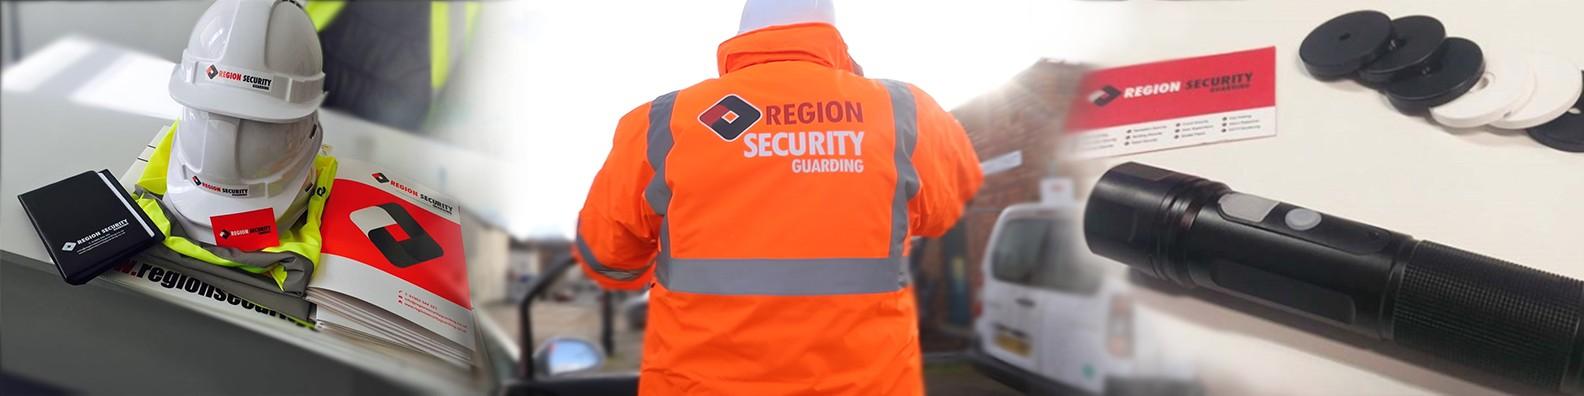 Region Security Guarding Ltd | LinkedIn